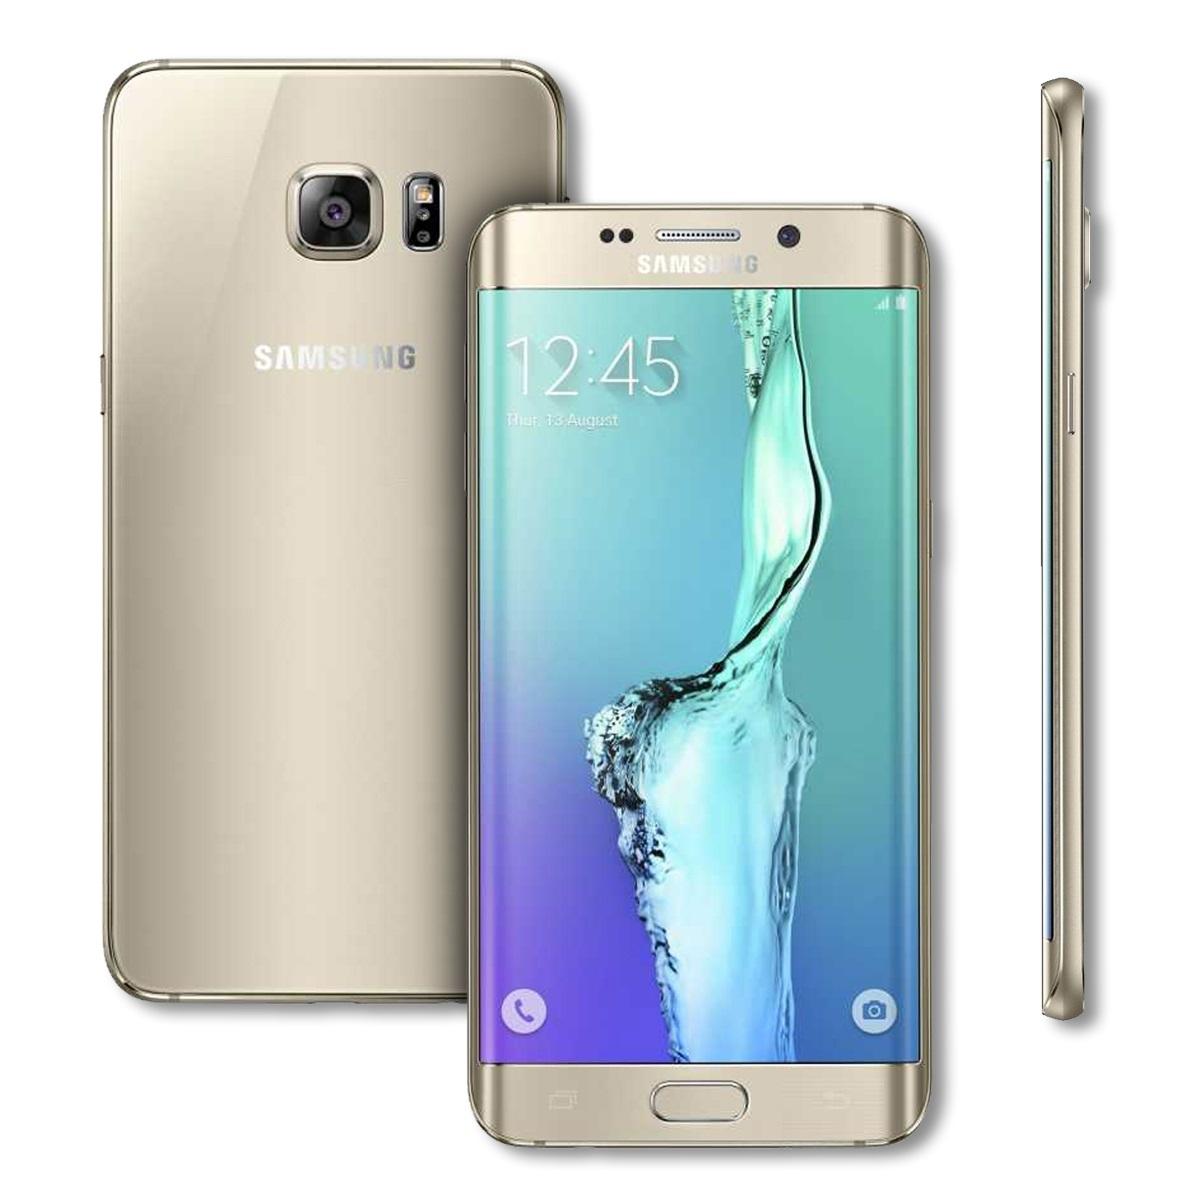 Samsung Galaxy S6 EDGE PLUS SM-G928V Smartphone Verizon 4G ...